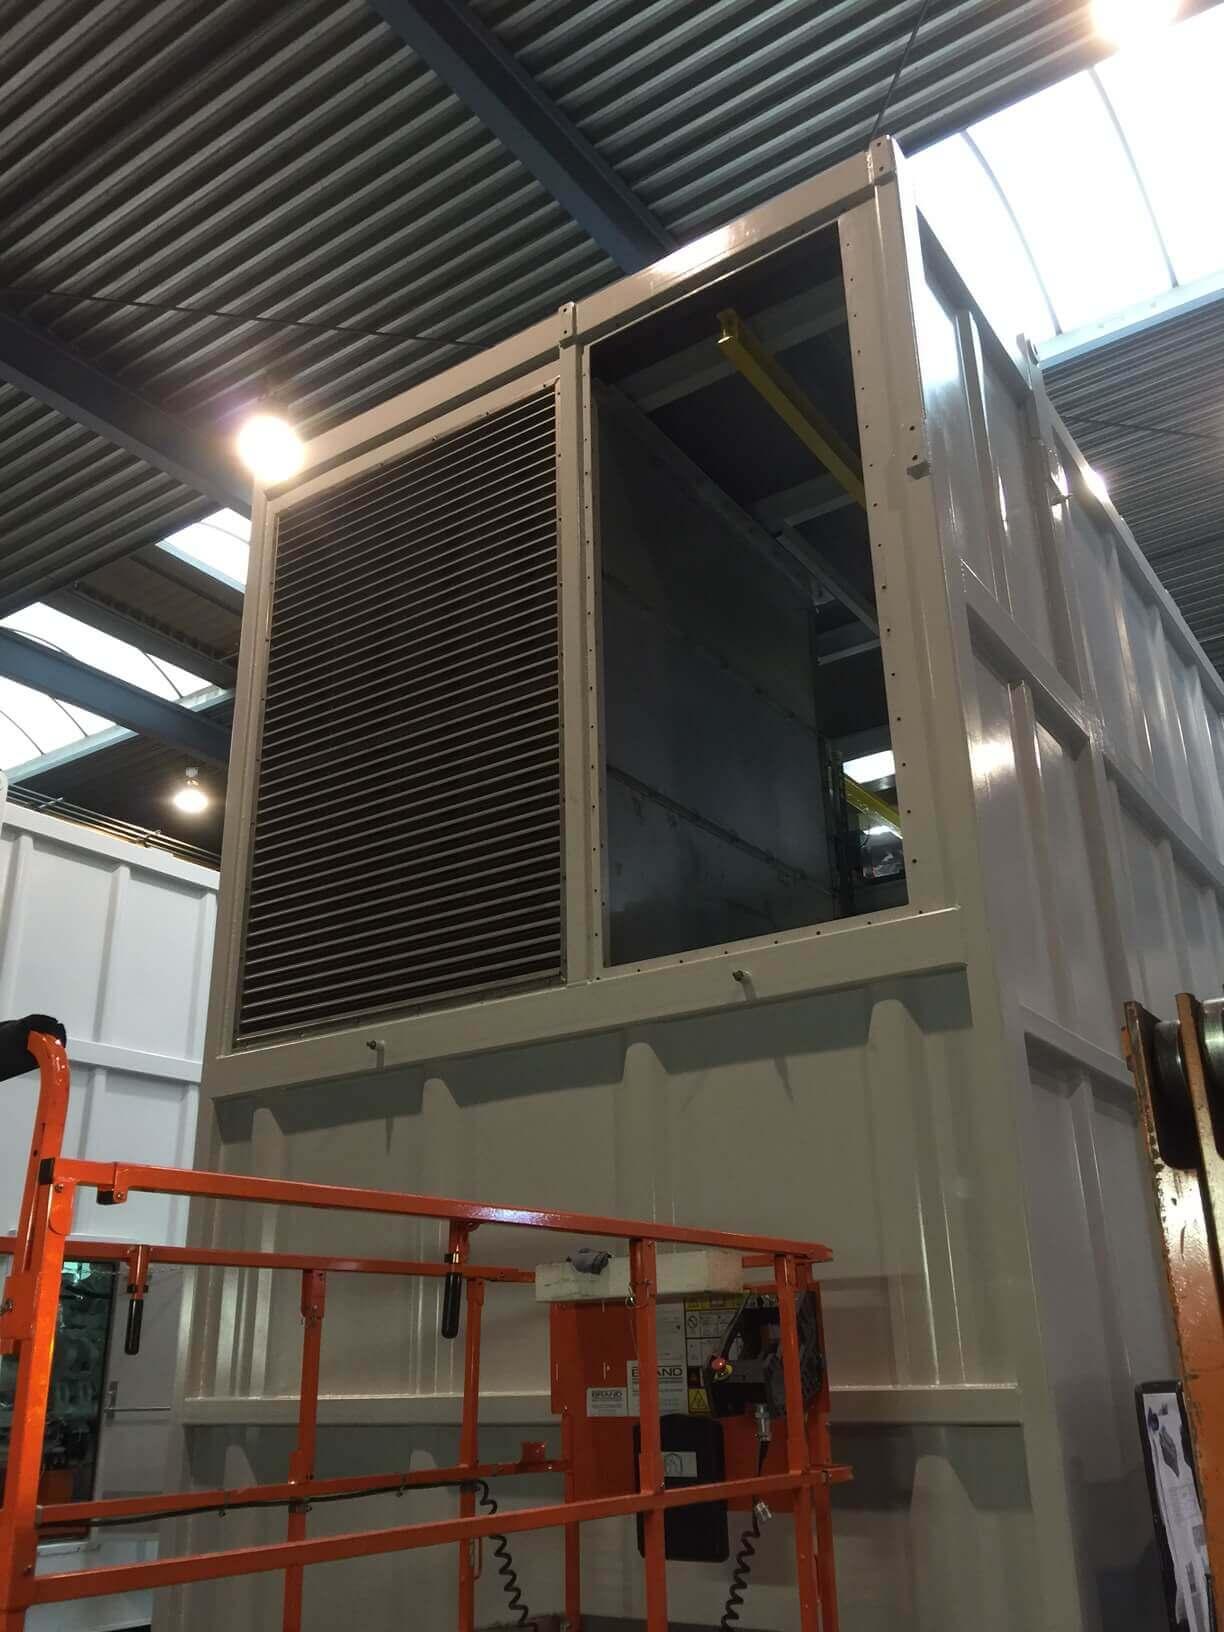 Ventilatie systeem FPSO